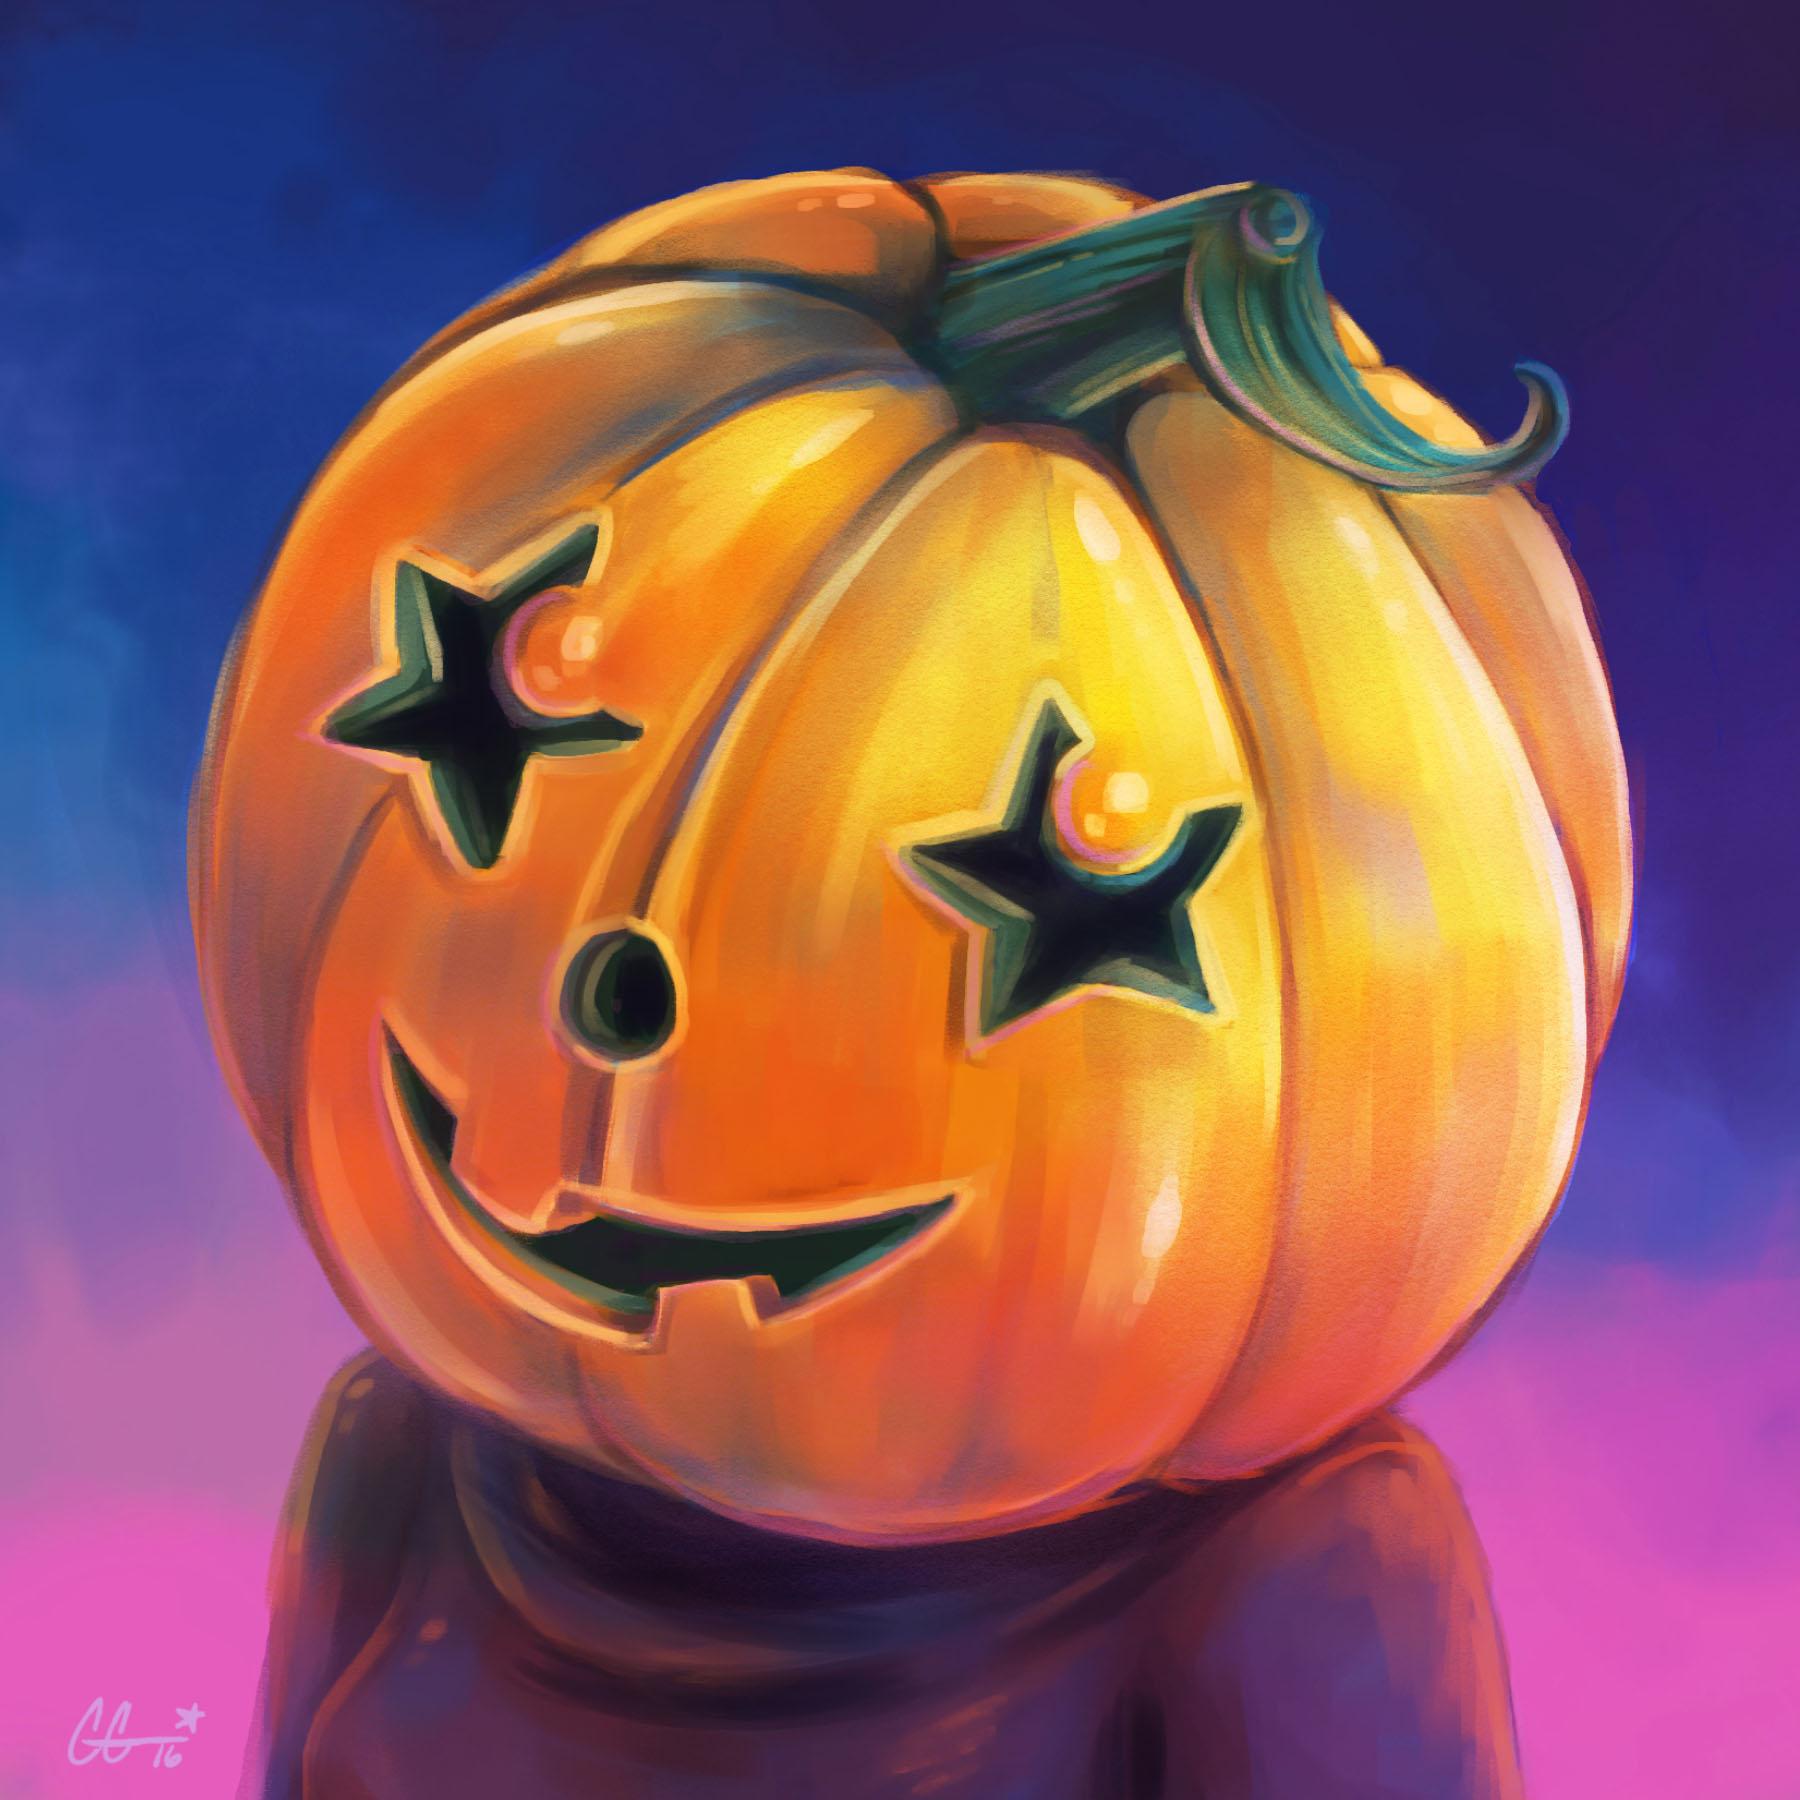 Pumpkin Head Halloween Portrait 2016